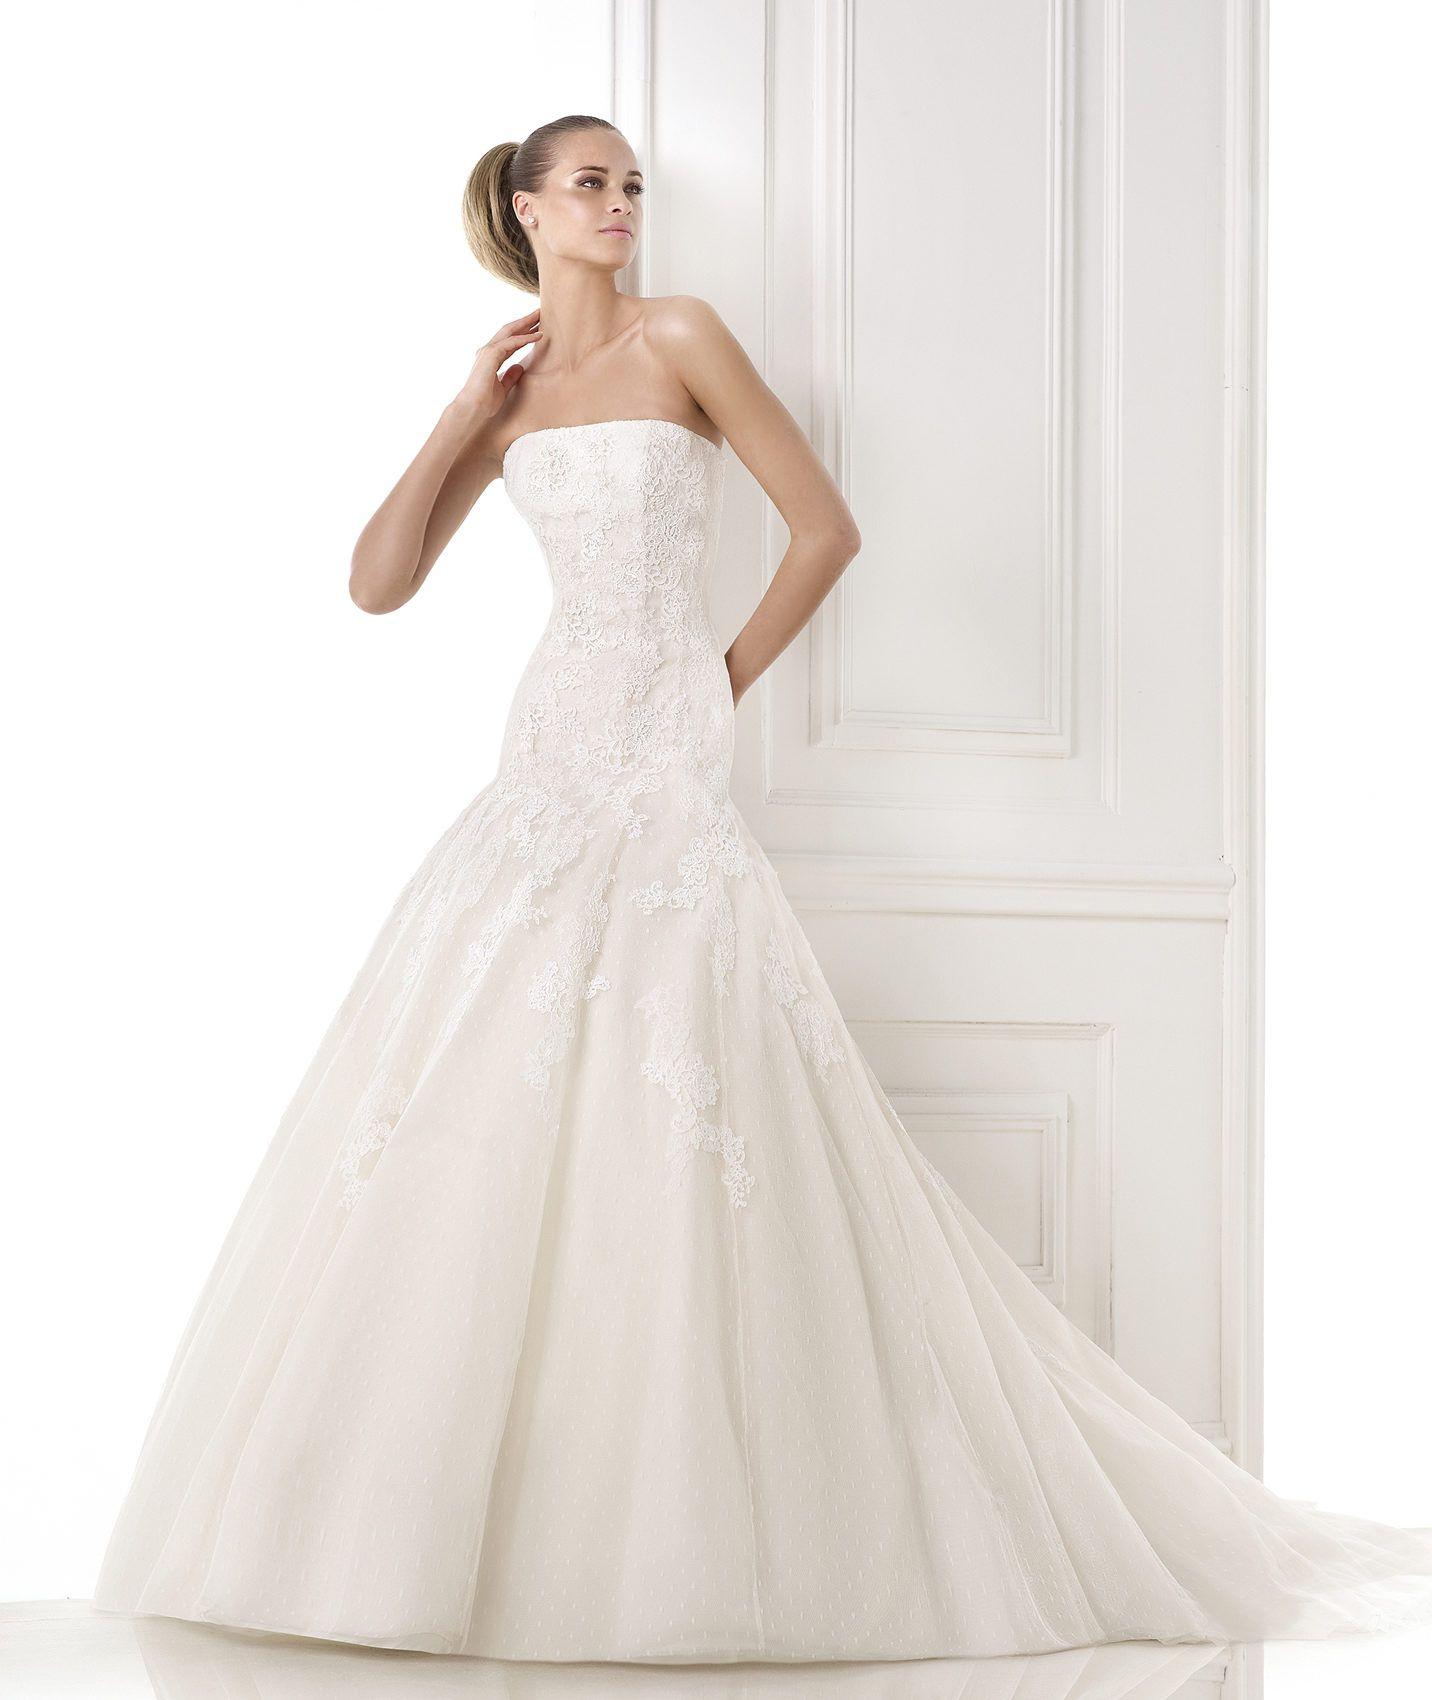 BILYANA Peach tulle wedding dress. Collection 2015